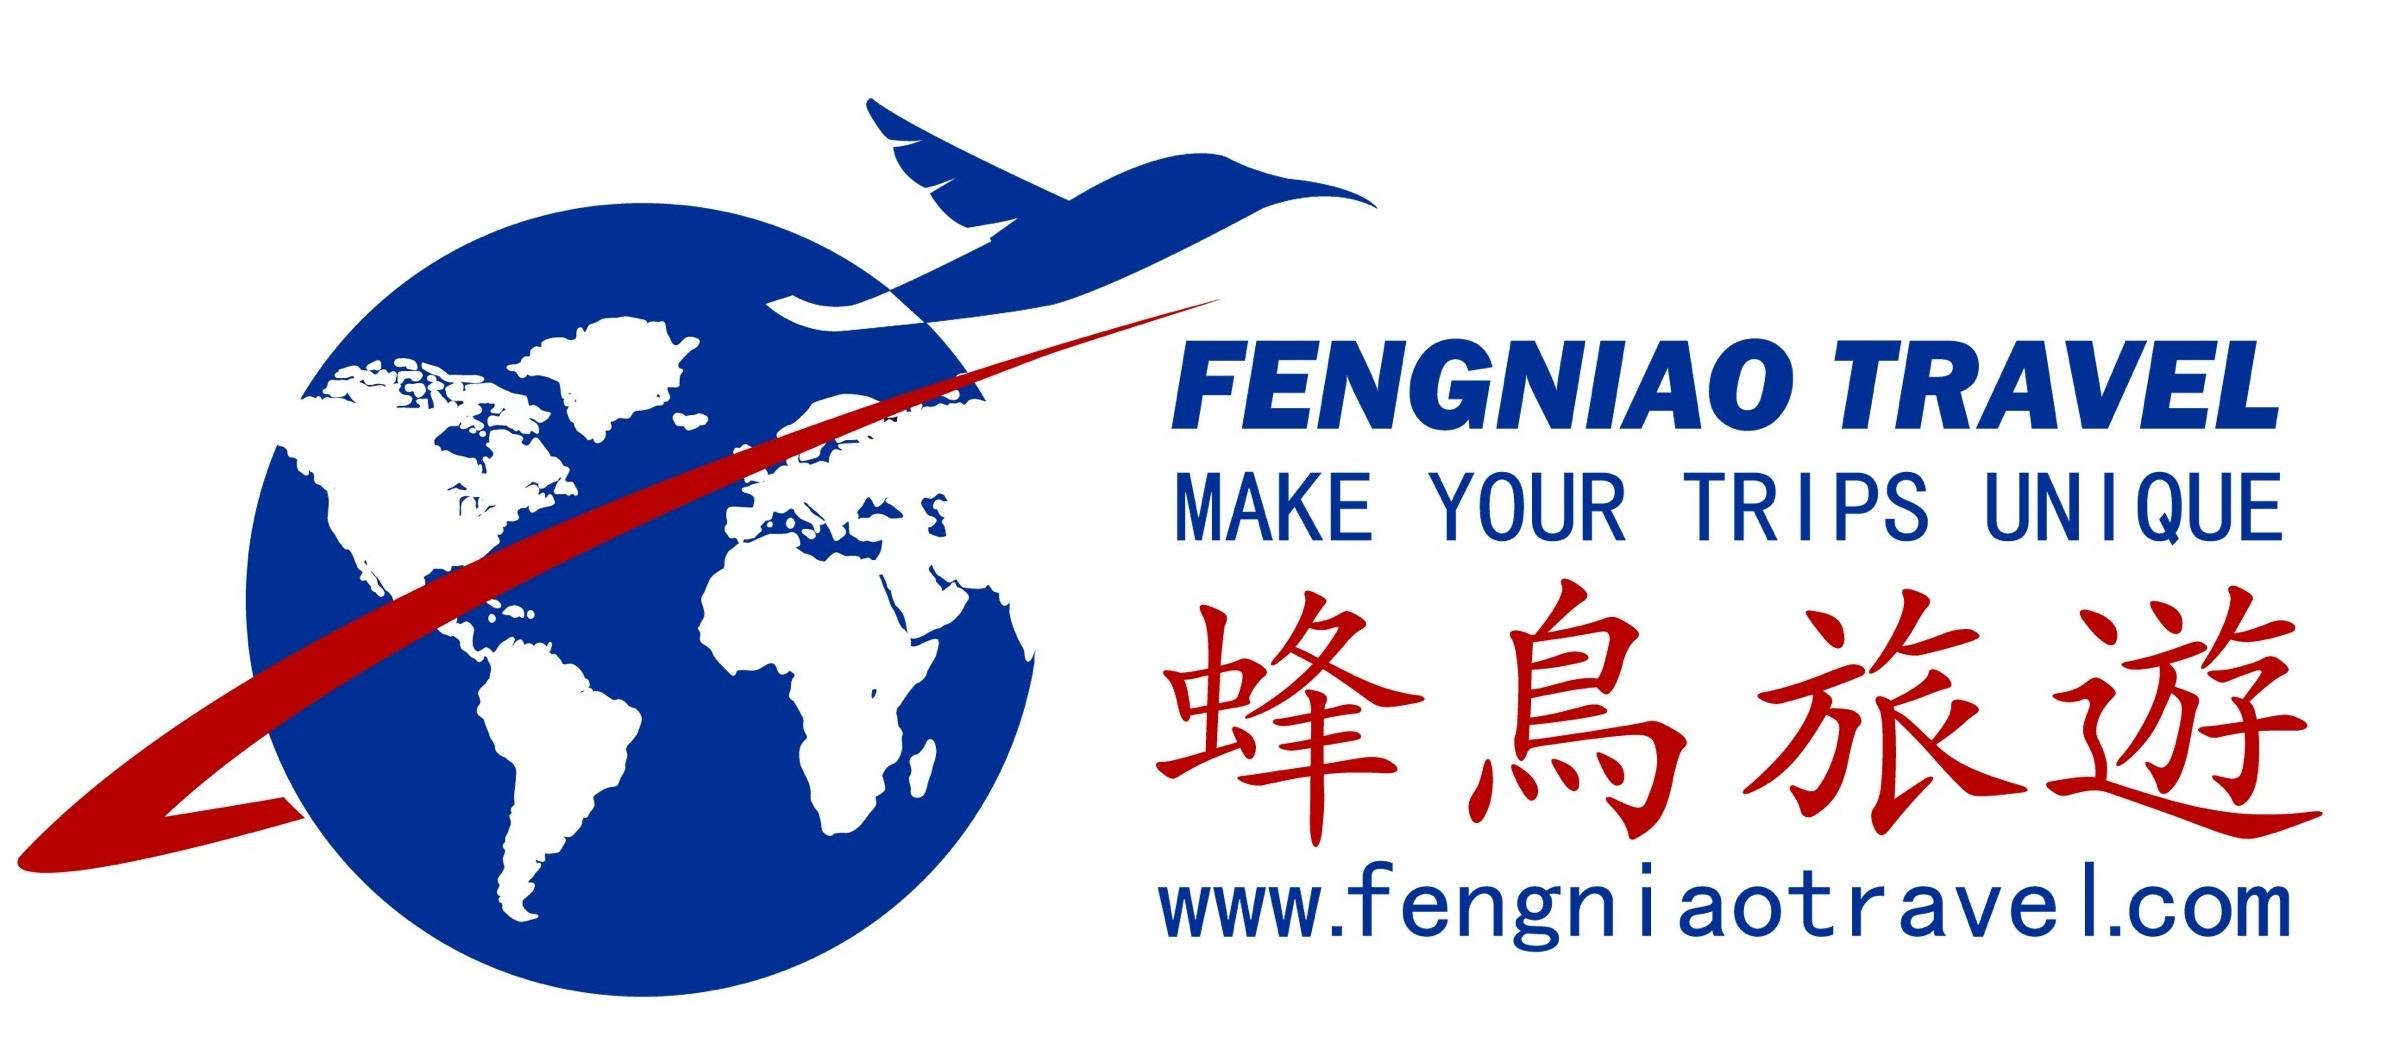 fengniaotravel_logo